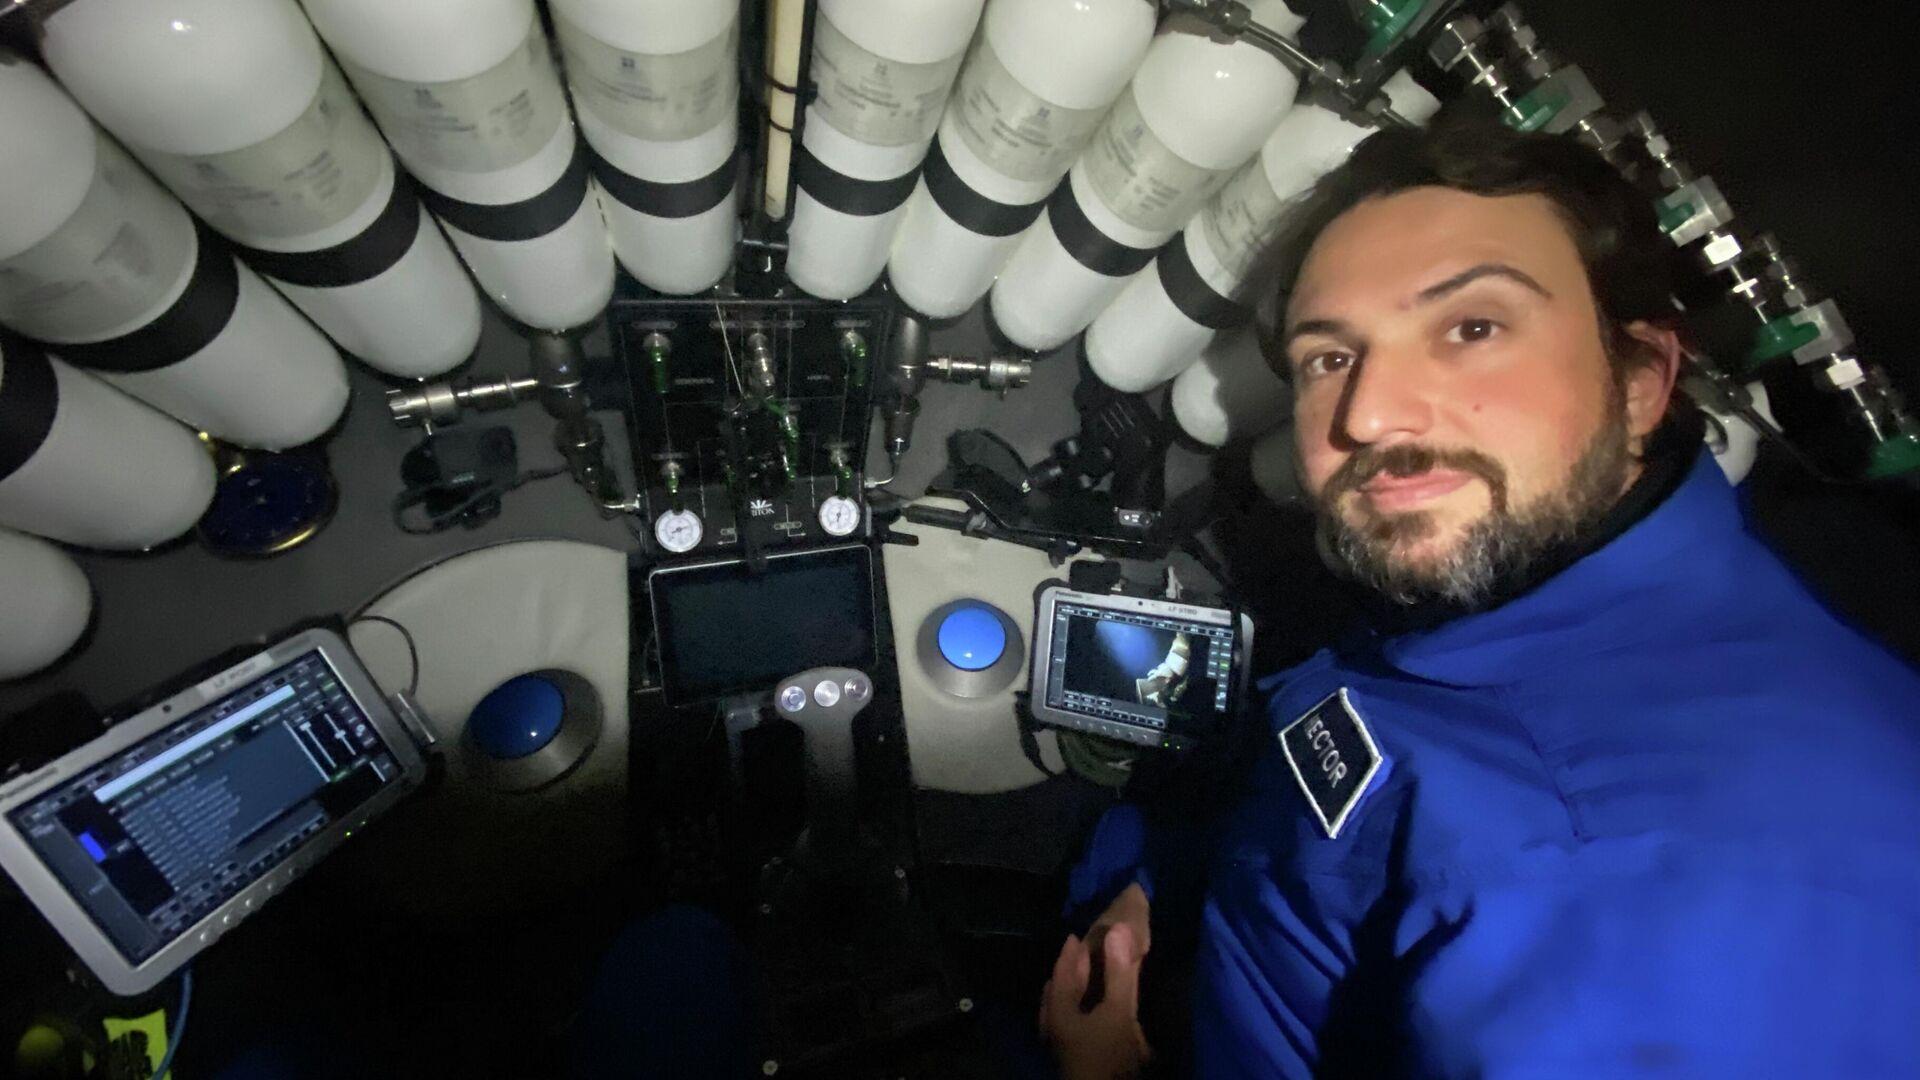 Héctor Salvador, a bordo del sumergible DSV LImiting Factor - Sputnik Mundo, 1920, 05.05.2021